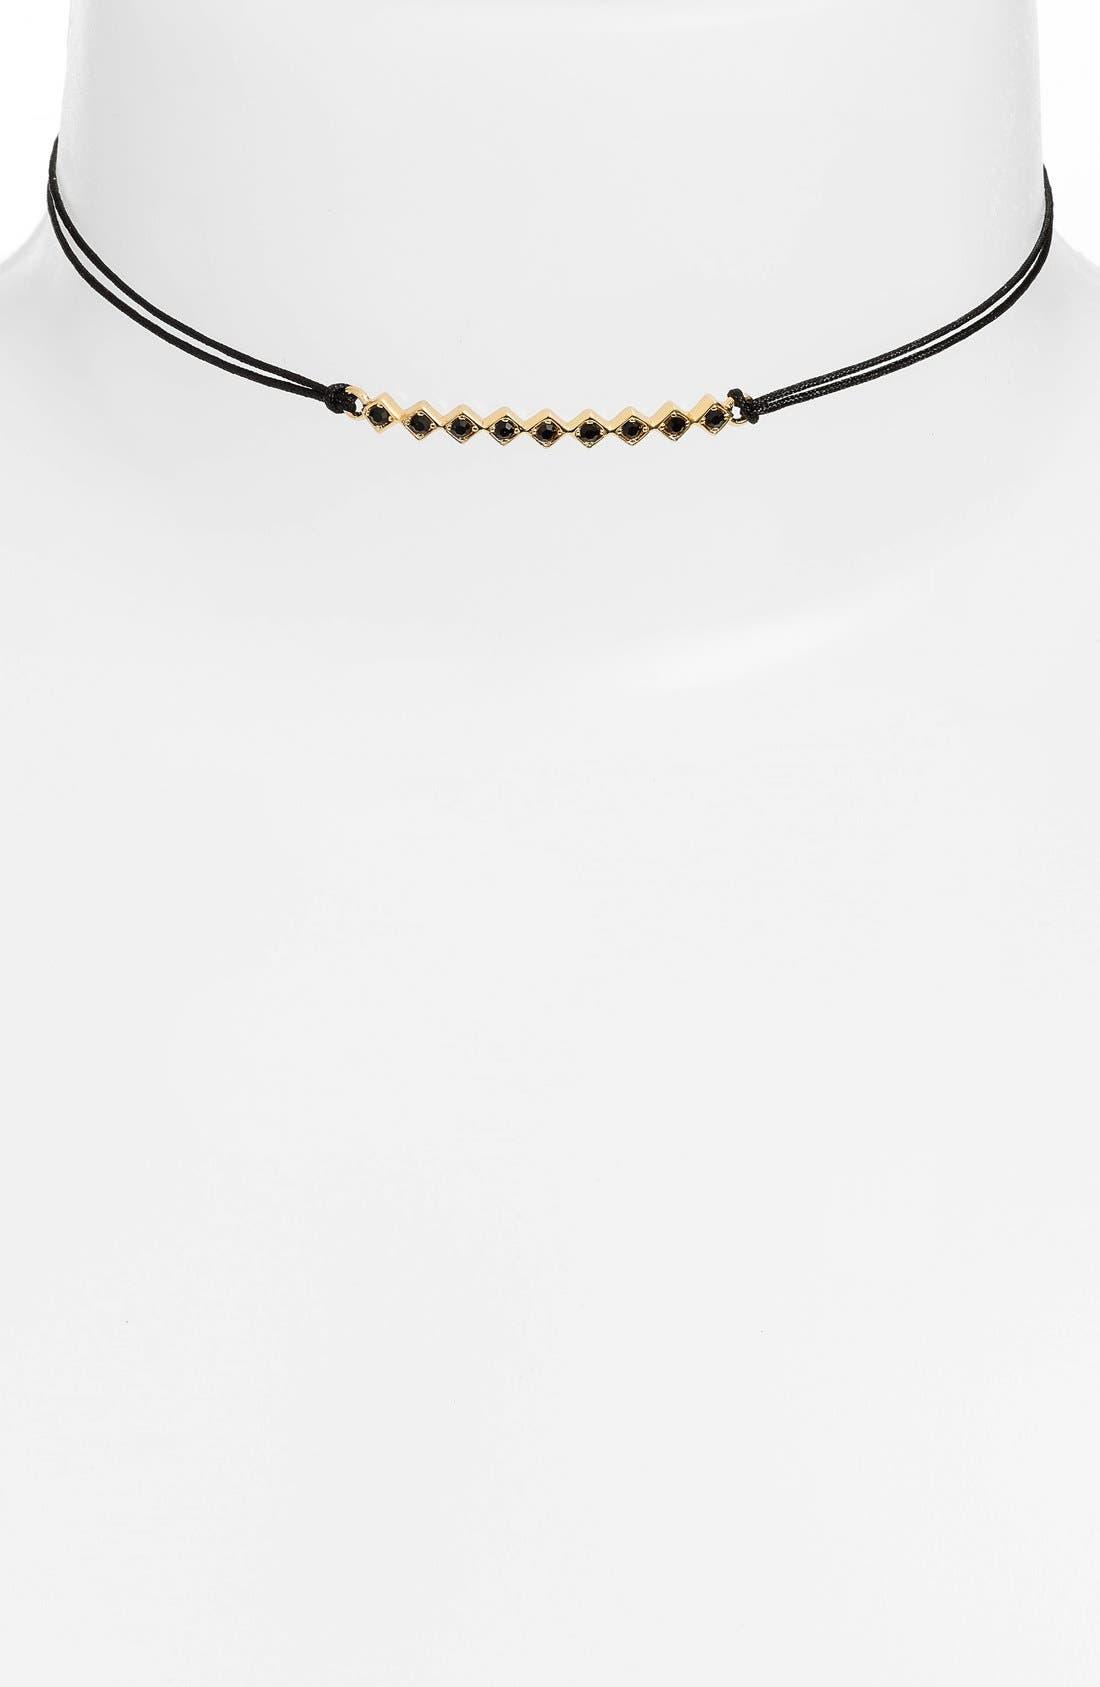 'Tulum' Crystal Bar Pendant Choker,                             Main thumbnail 1, color,                             BLACK/ YELLOW GOLD/ BLACK